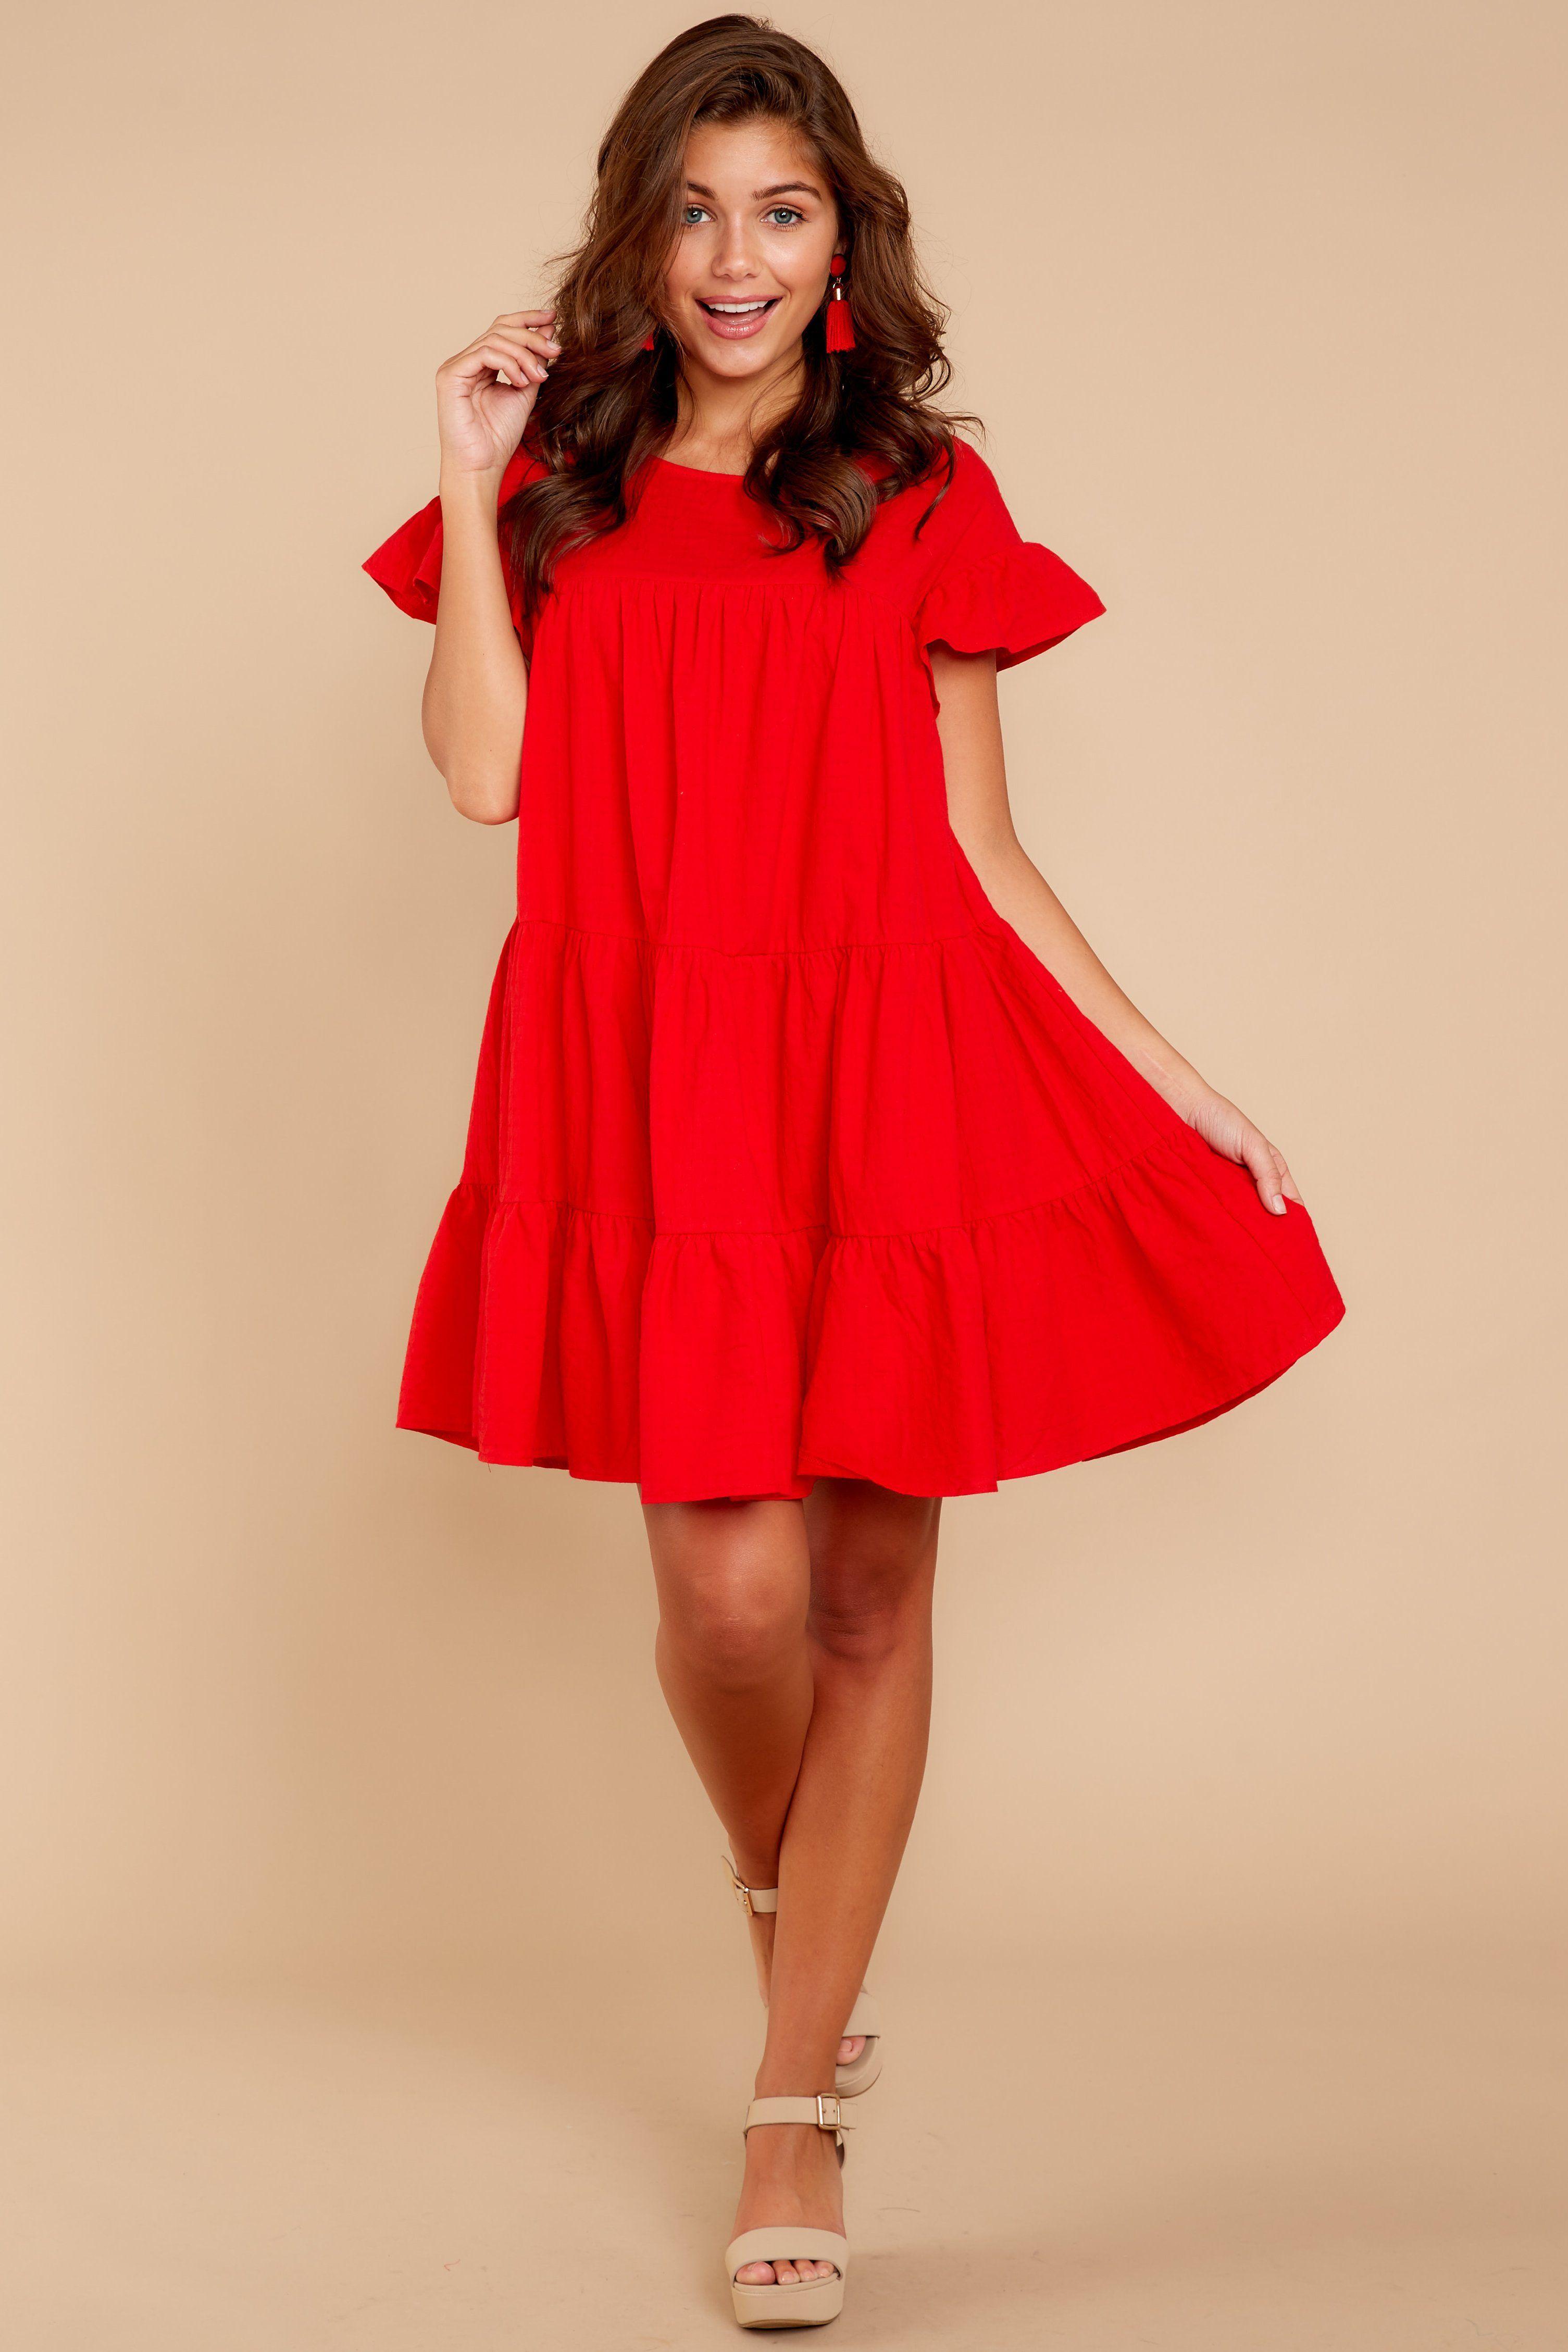 8537dcb64827 Chic Red Shift Dress - Short Ruffled Babydoll Dress - Dress - $49.00 – Red  Dress Boutique